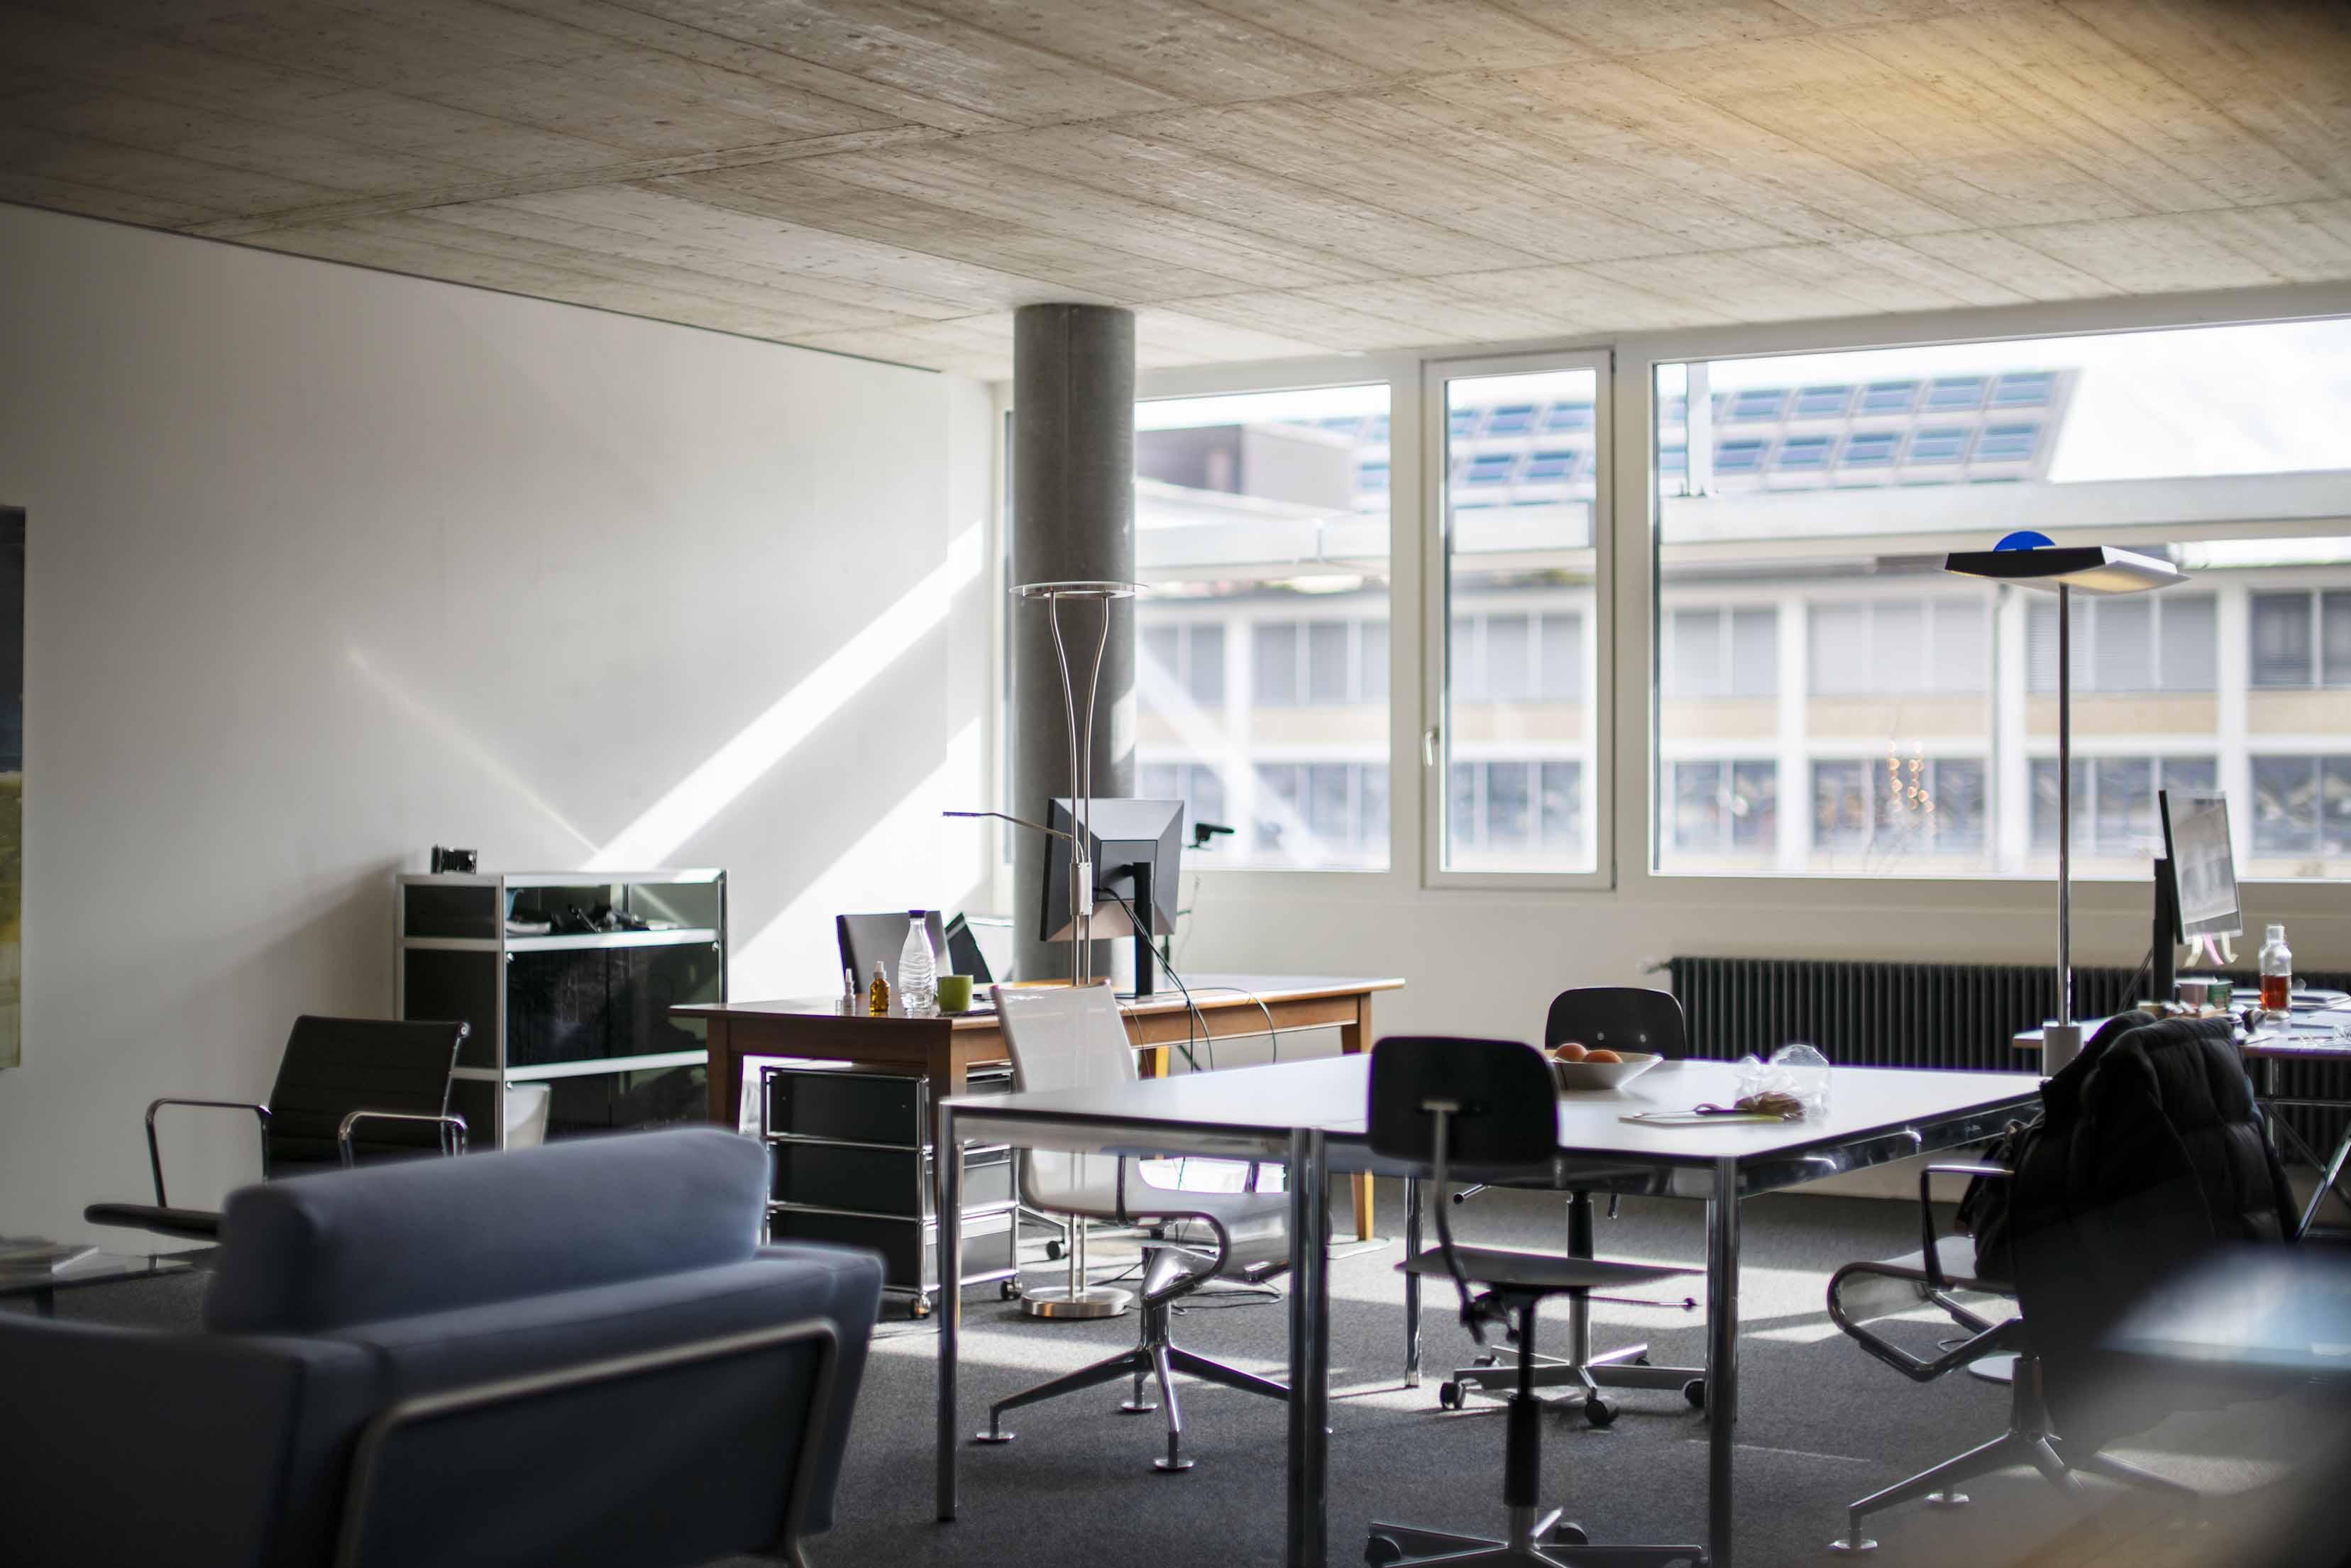 büroraum, mieten vermieten und untermieten, bürogemeinschaft, kreativ büro - dream office, atelier gemeinschaft. arbeitsplätze